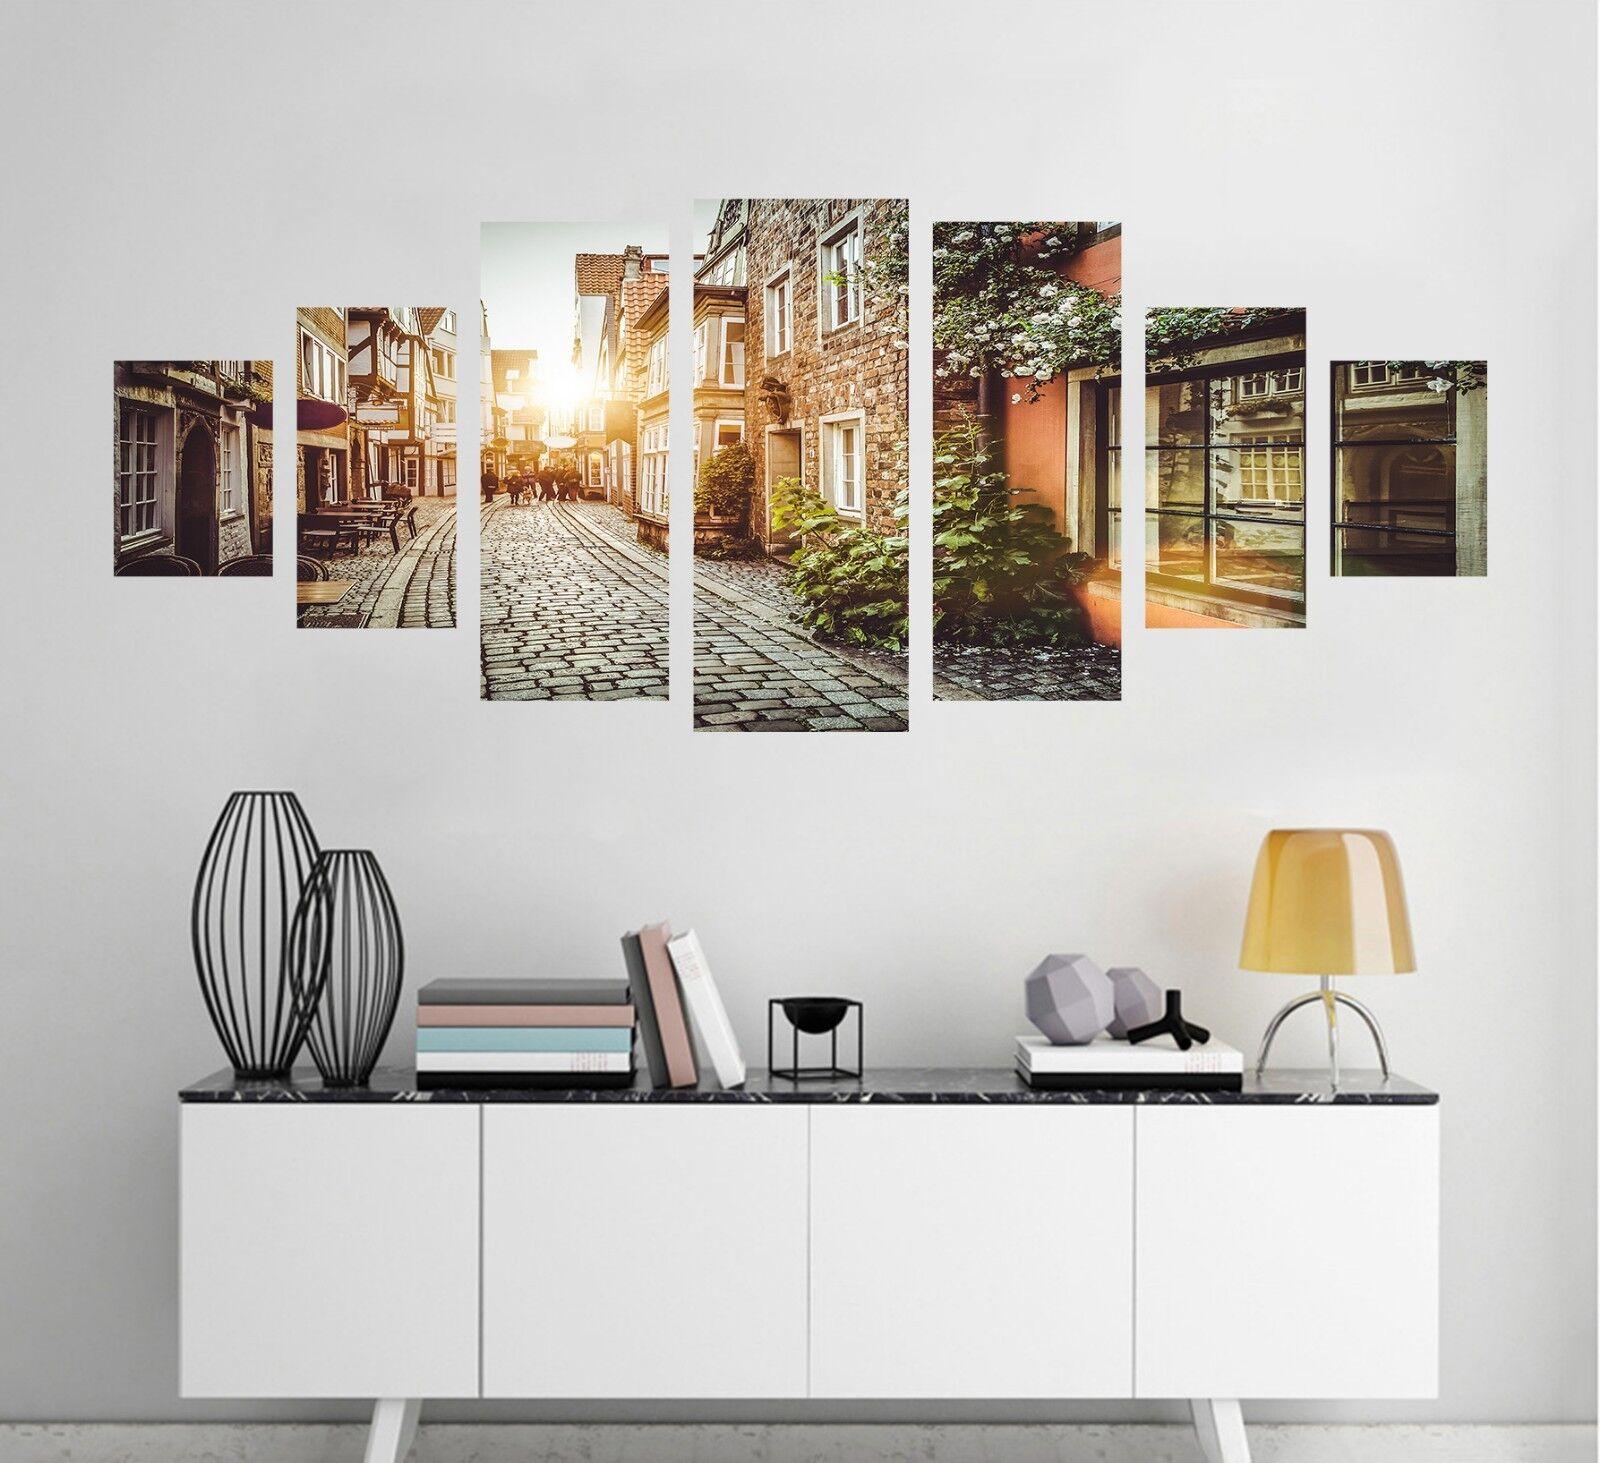 3D City Sunlight 58 Unframed Print Wall Paper Decal Wall Deco Indoor AJ Wall